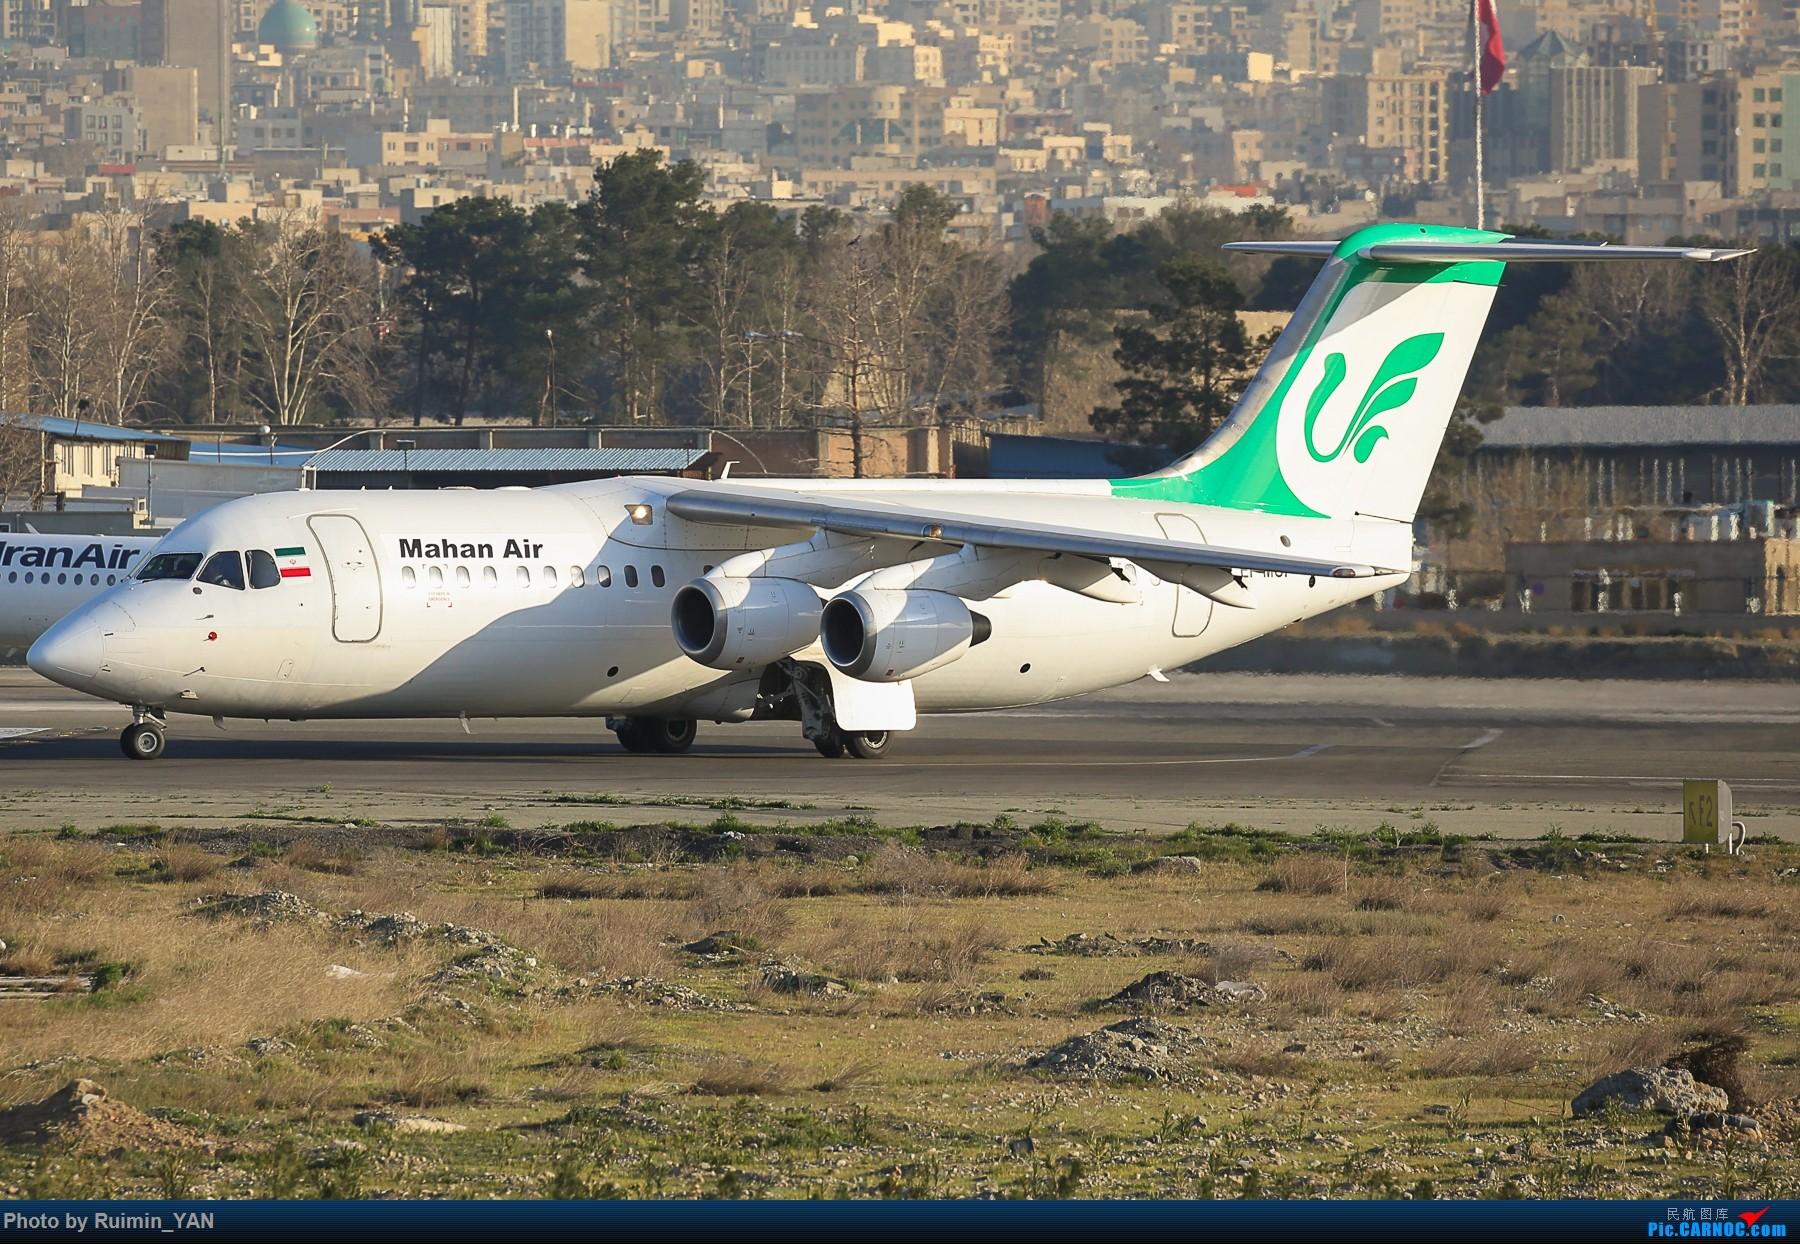 【THR】(德黑兰梅赫拉巴德机场)马汉航空(Mahan Air,W5)--RJ100 BRITISH AEROSPACE BAE-146-300 EP-MOI 伊朗德黑兰机场